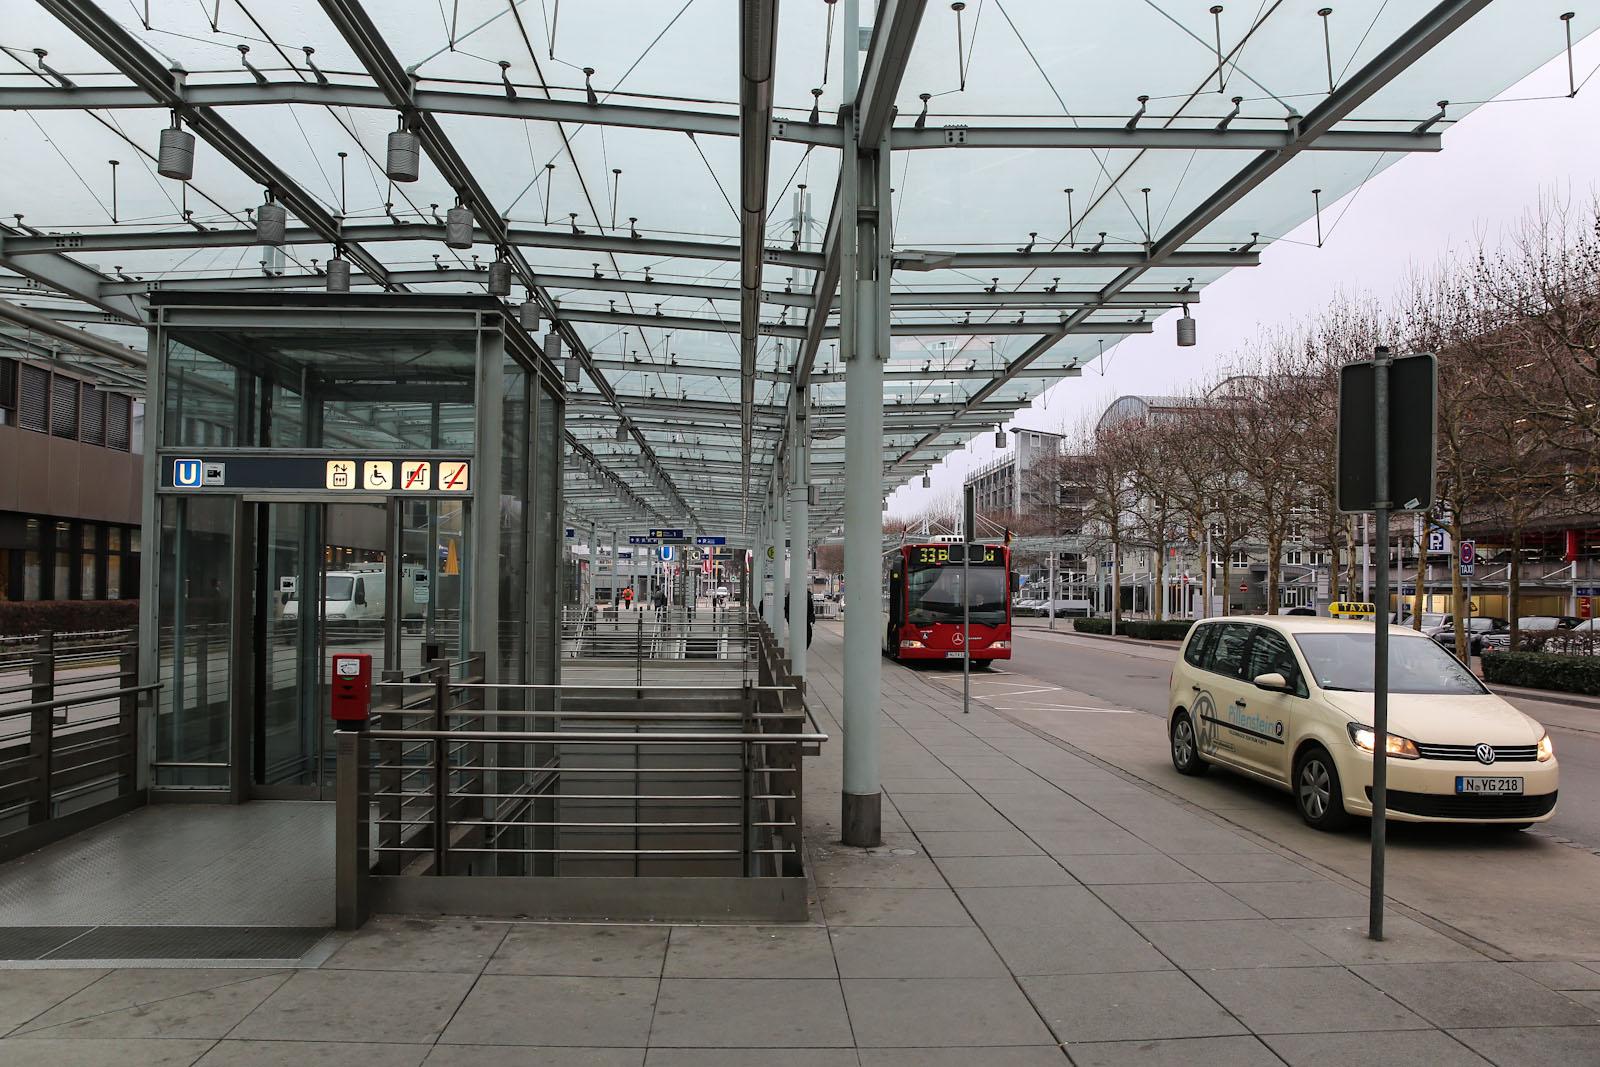 Остановка автобусов и такси в аэропорту Нюрнберг